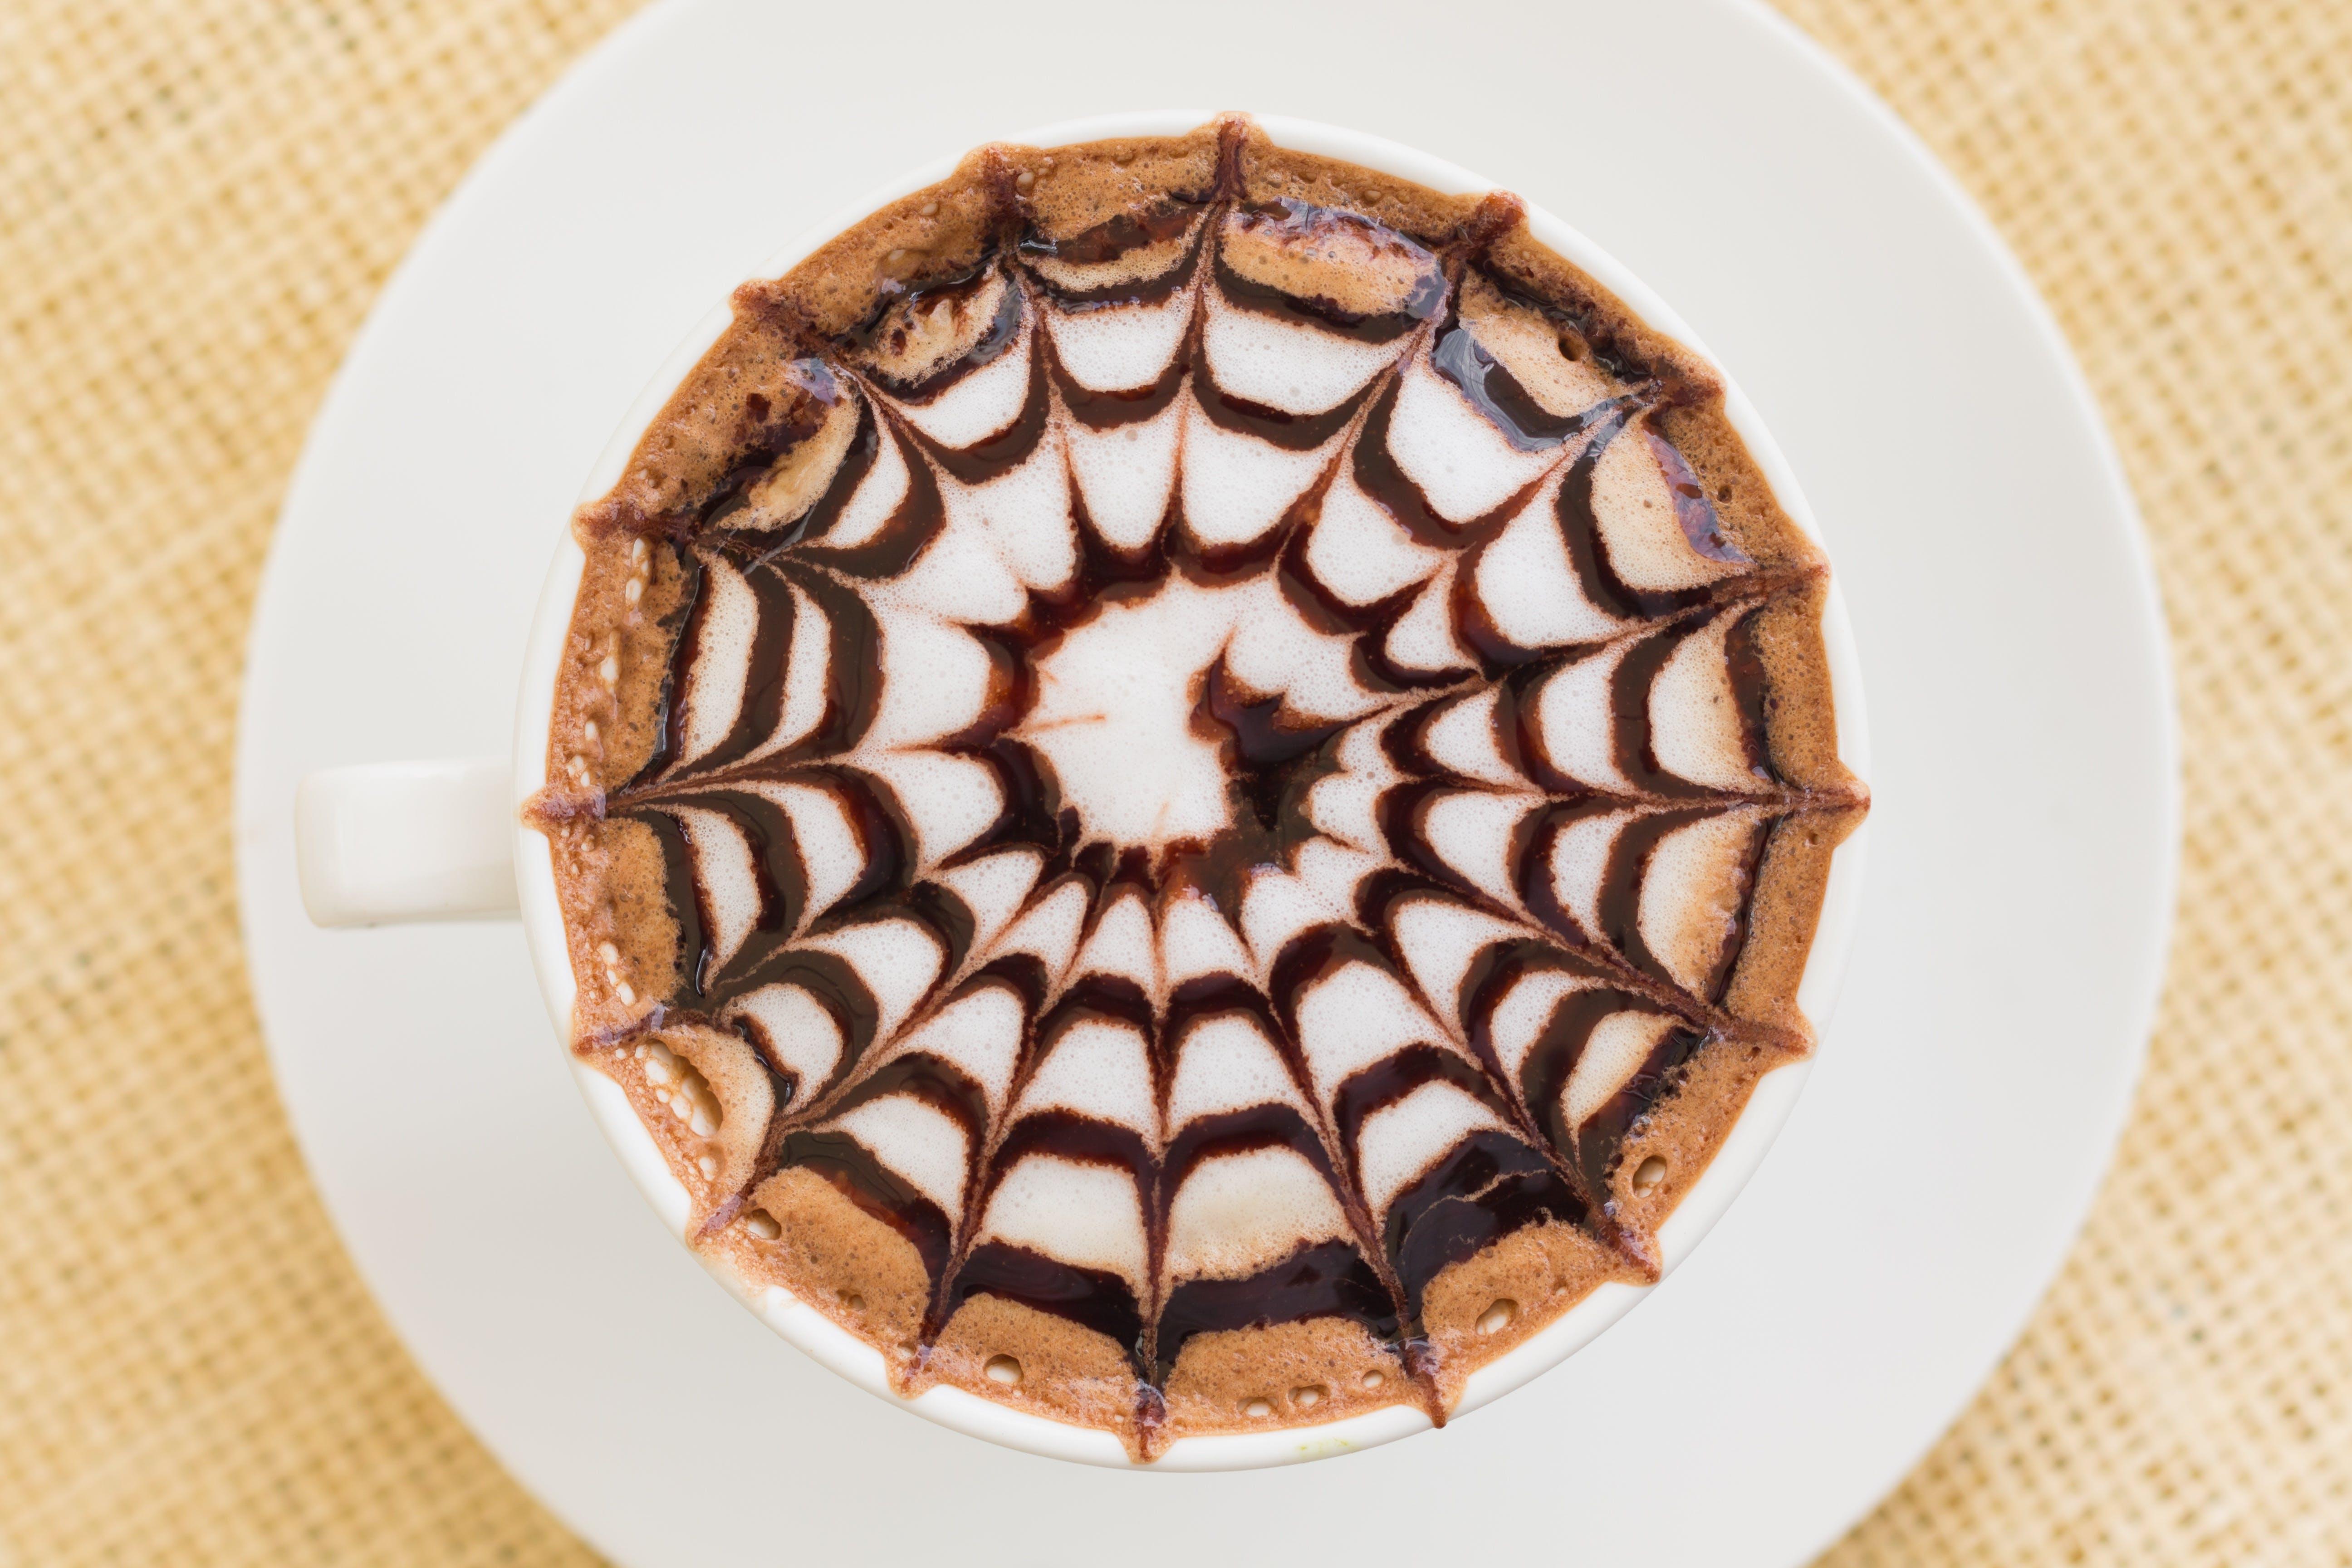 Cappuccino Coffee on Mug